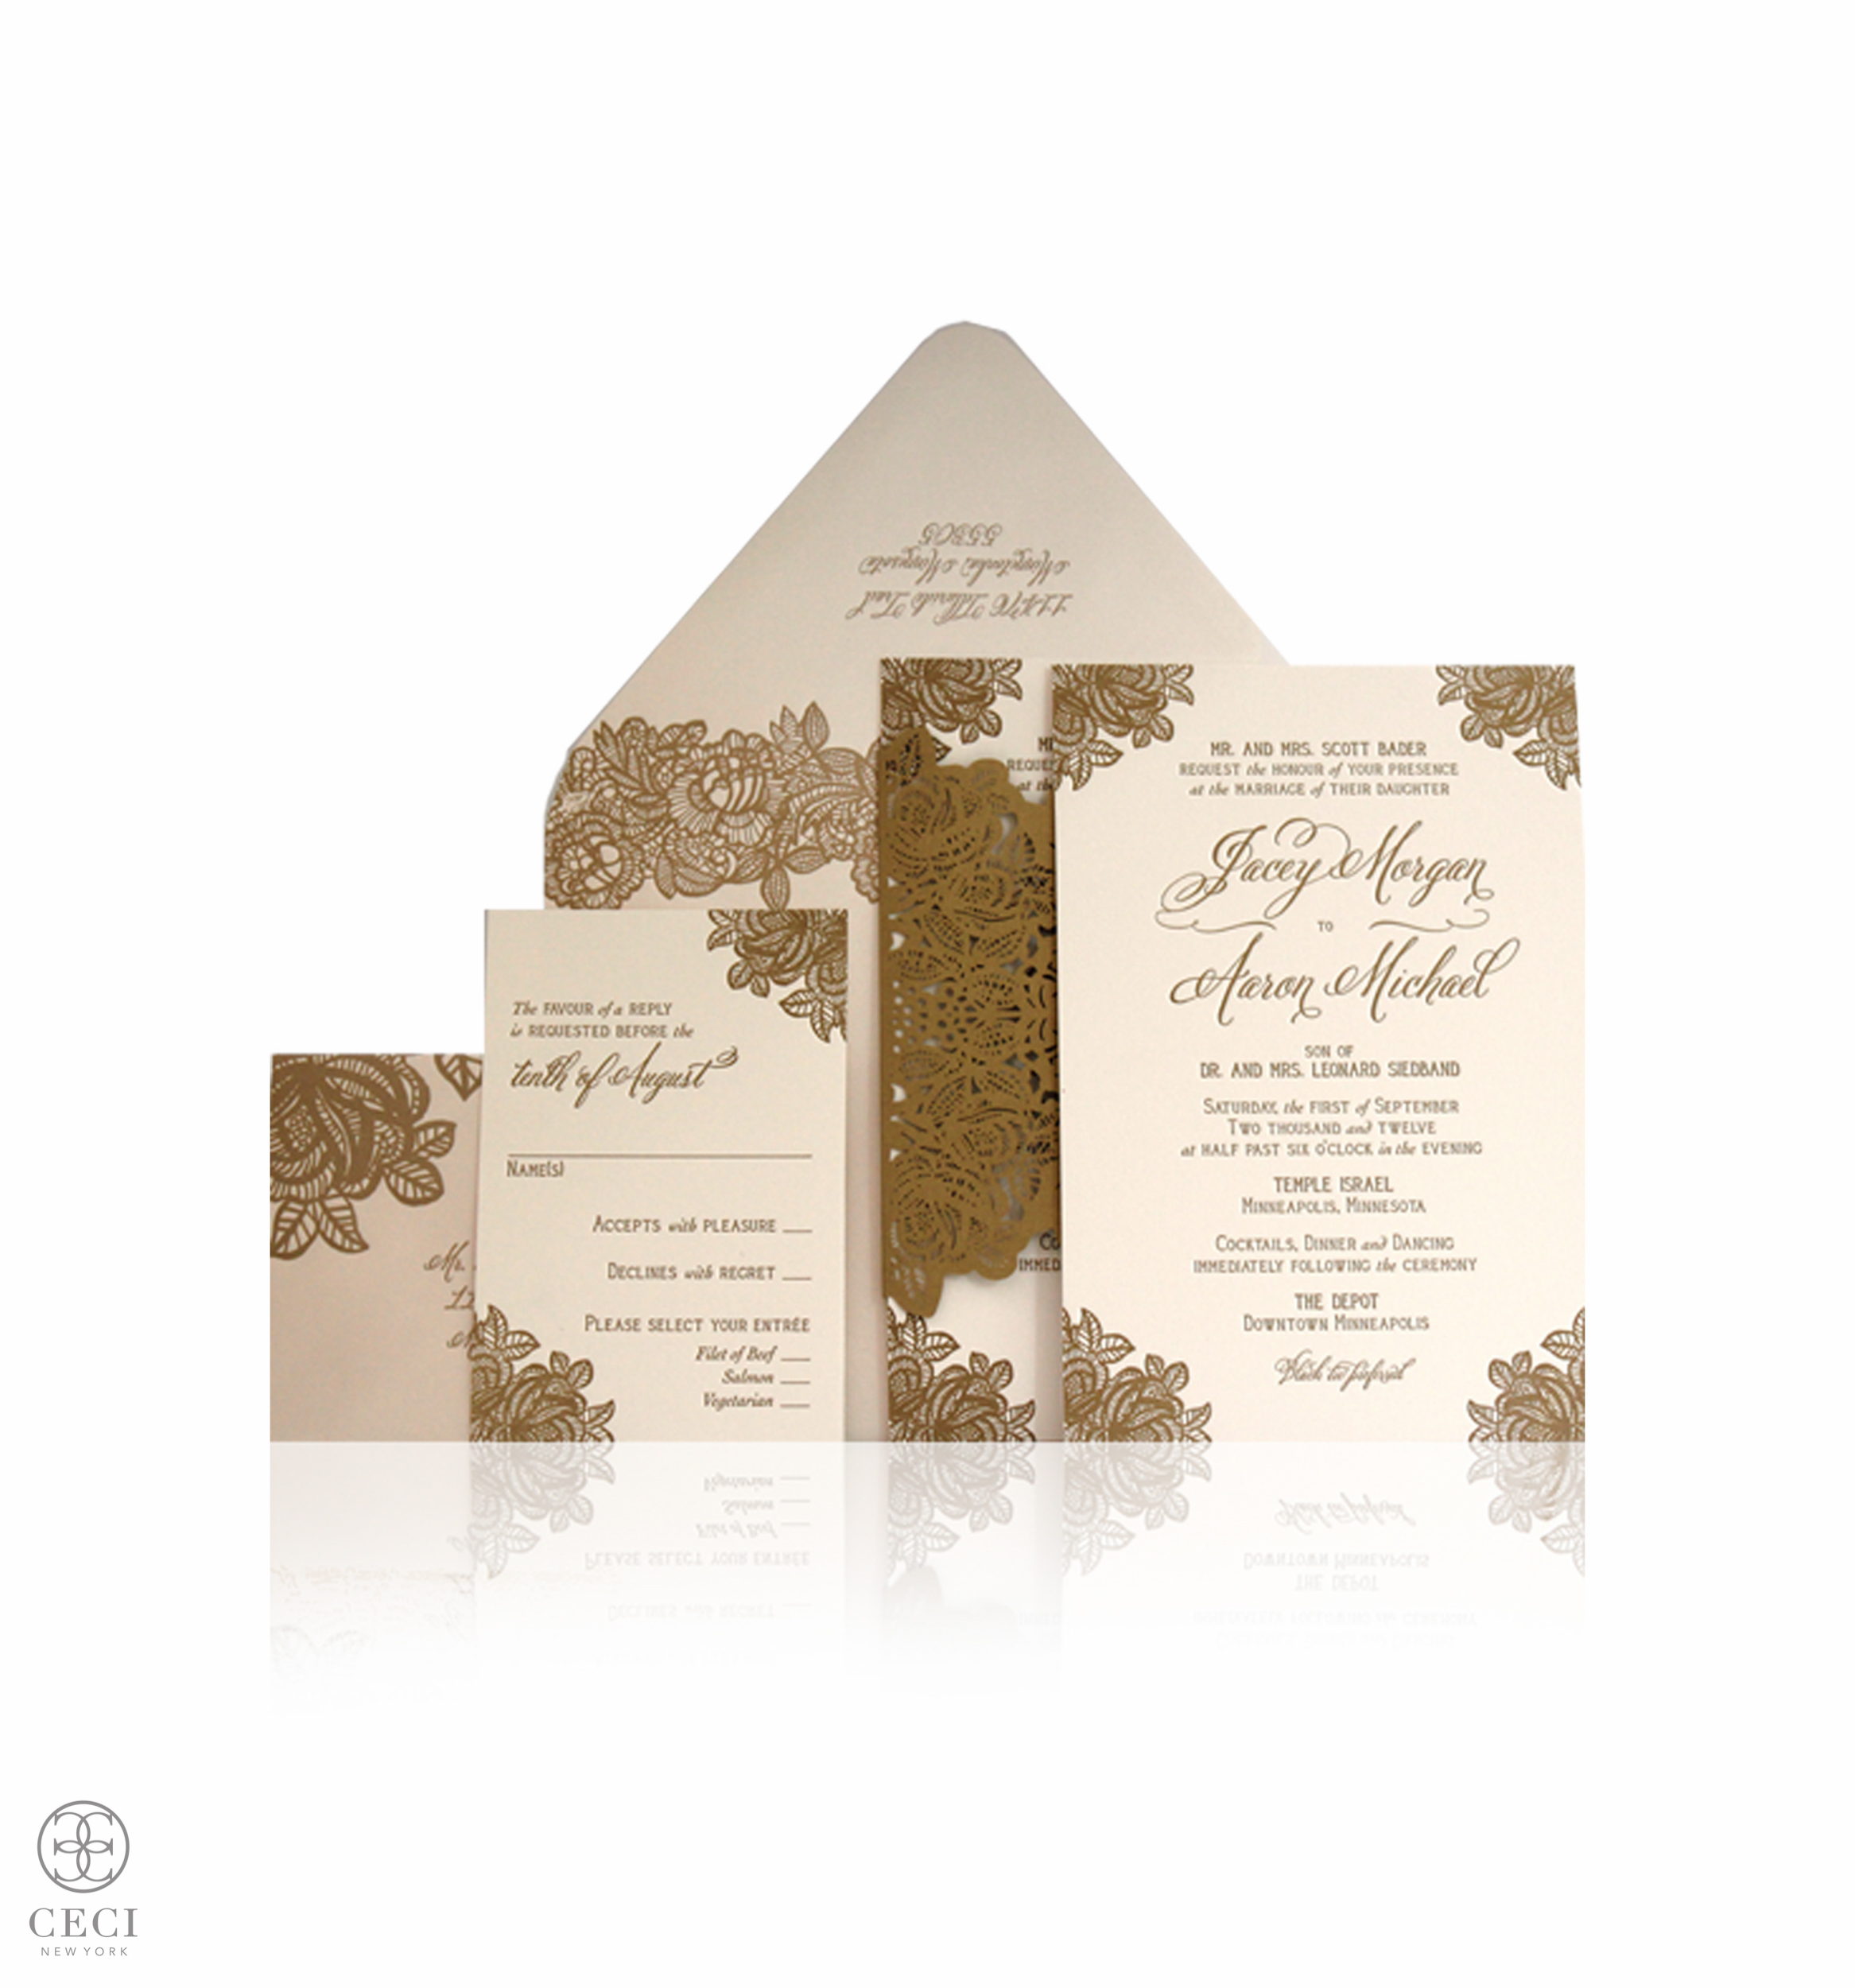 Ceci_New_York_Ceci_Style_Ceci_Johnson_Luxury_Lifestyle_Floral_Lace_Wedding_Letterpress_Inspiration_Design_Custom_Couture_Personalized_Invitations_-11.jpg